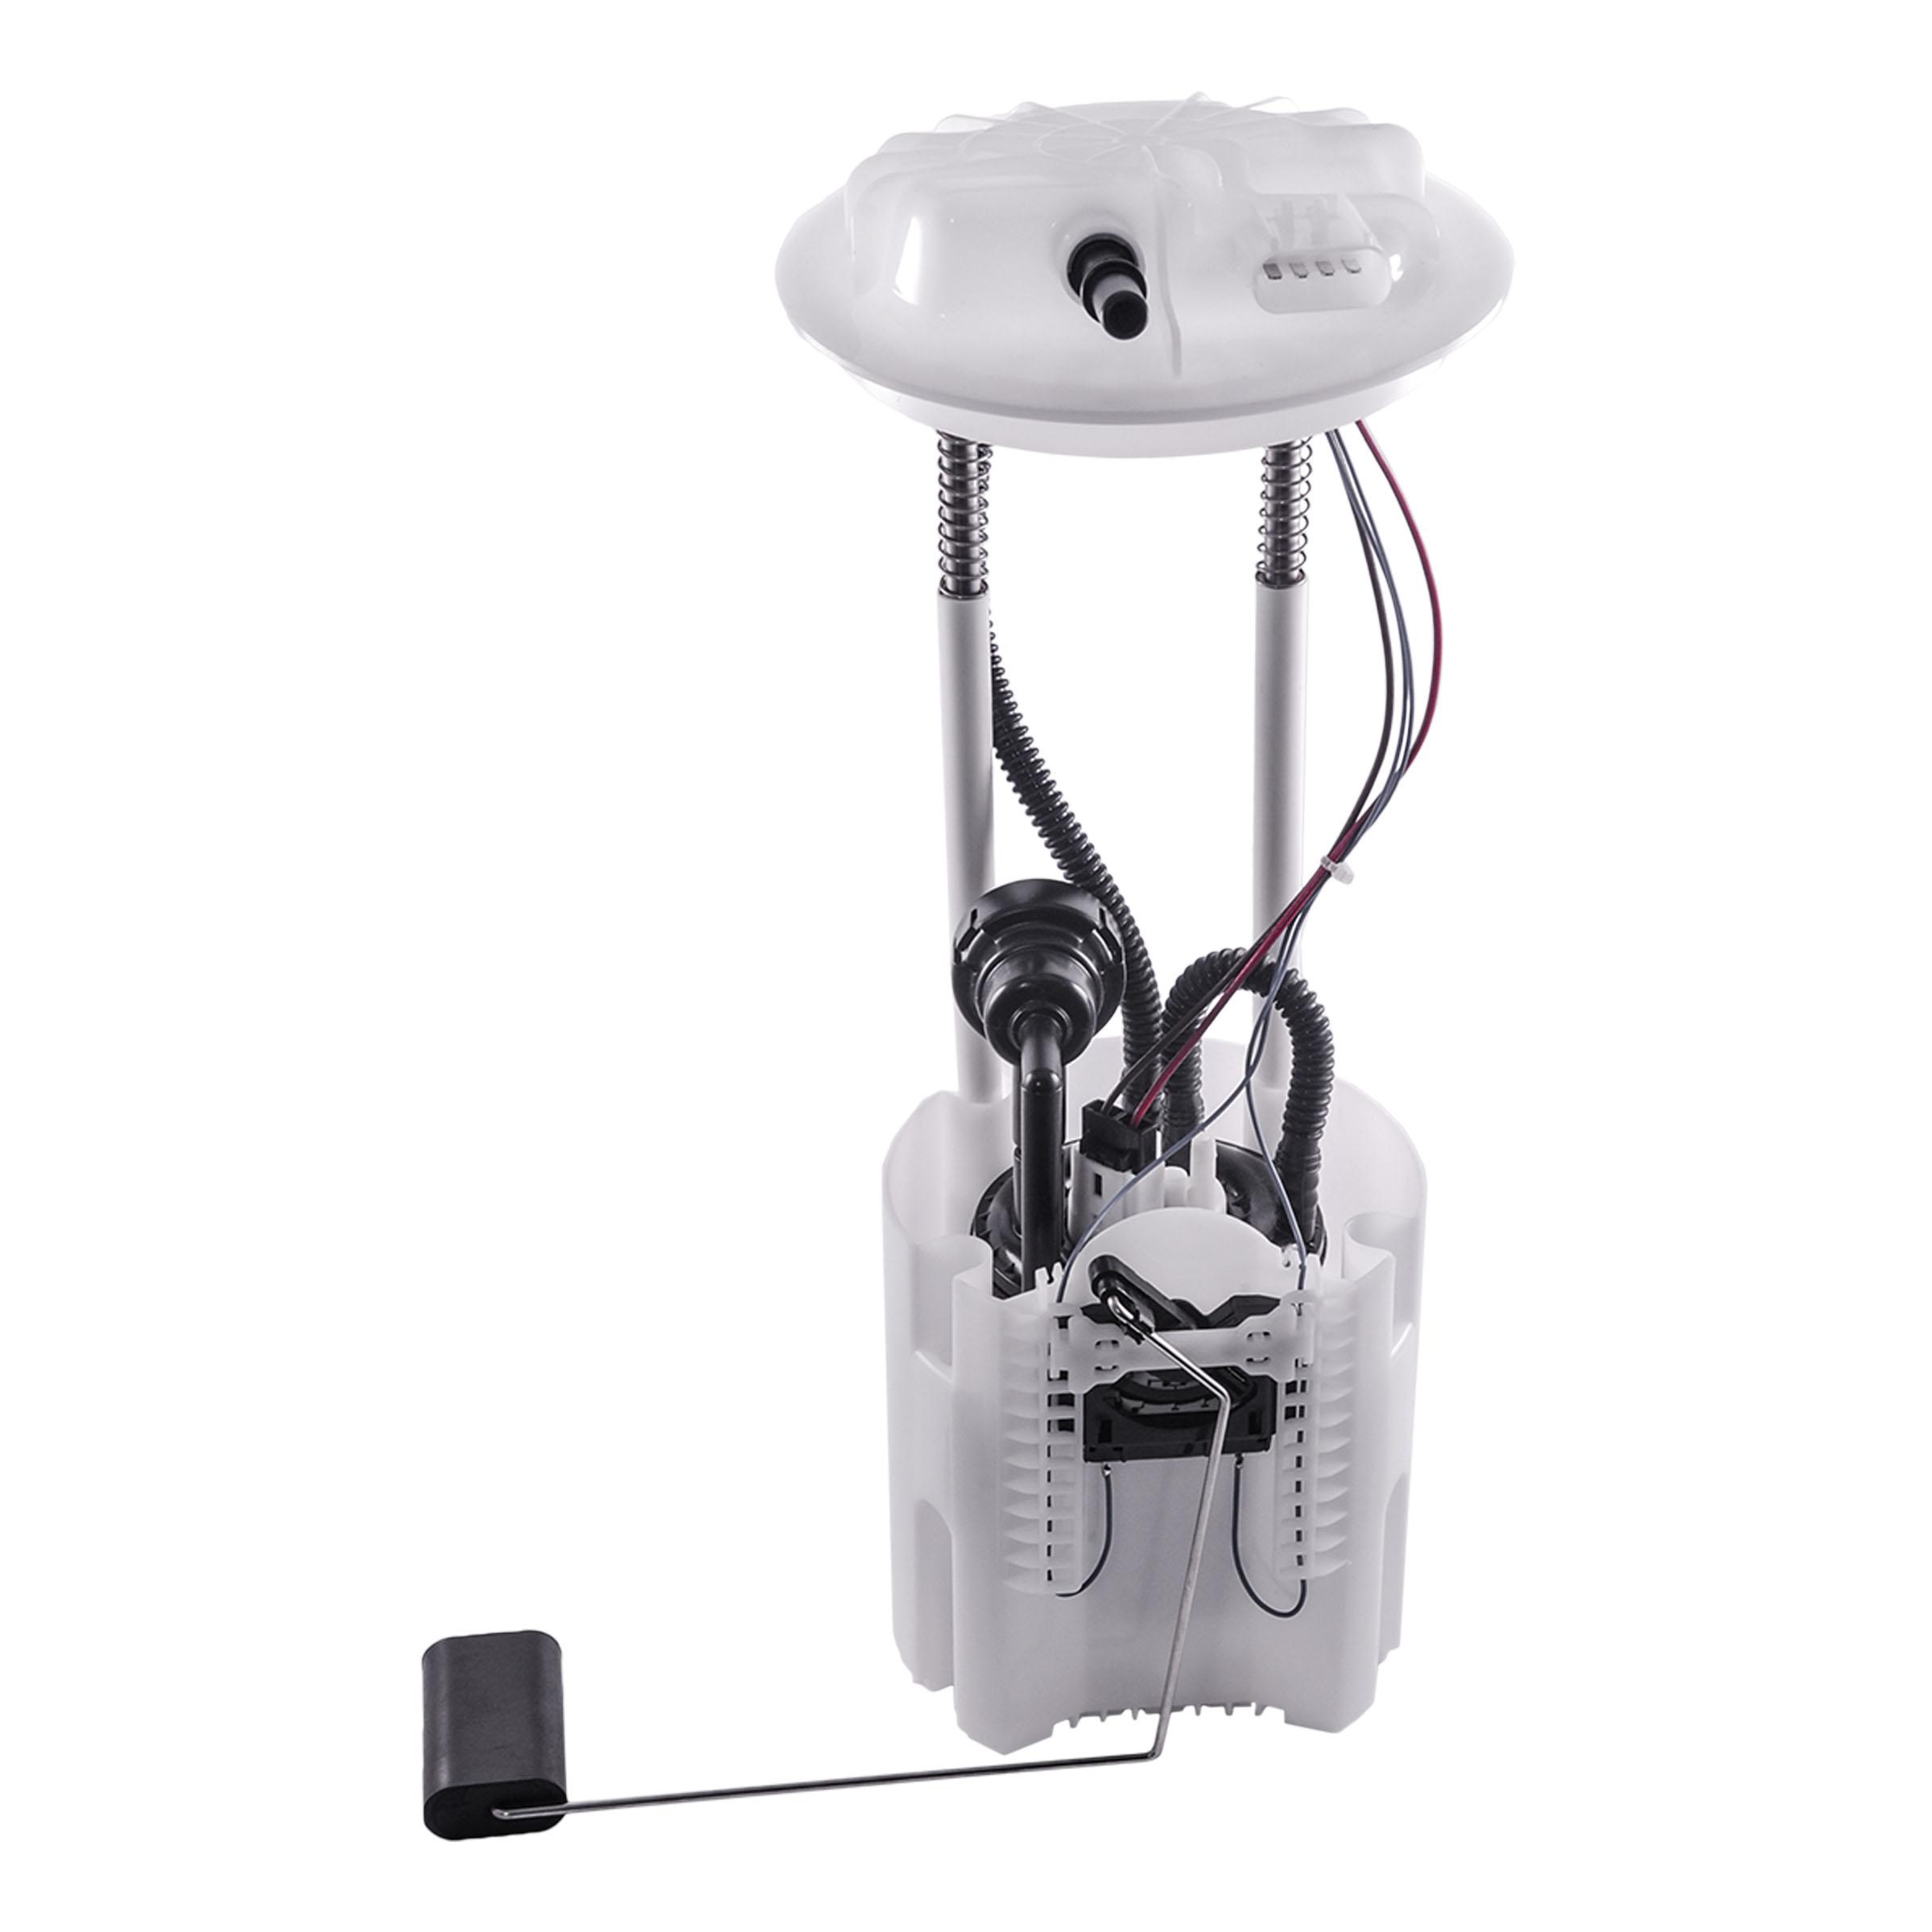 2008 dodge ram 1500 electric fuel filter new premium high performance fuel pump module 069ge for dodge ram 1500 2008 | ebay 2008 dodge ram 1500 wiring schematic #9